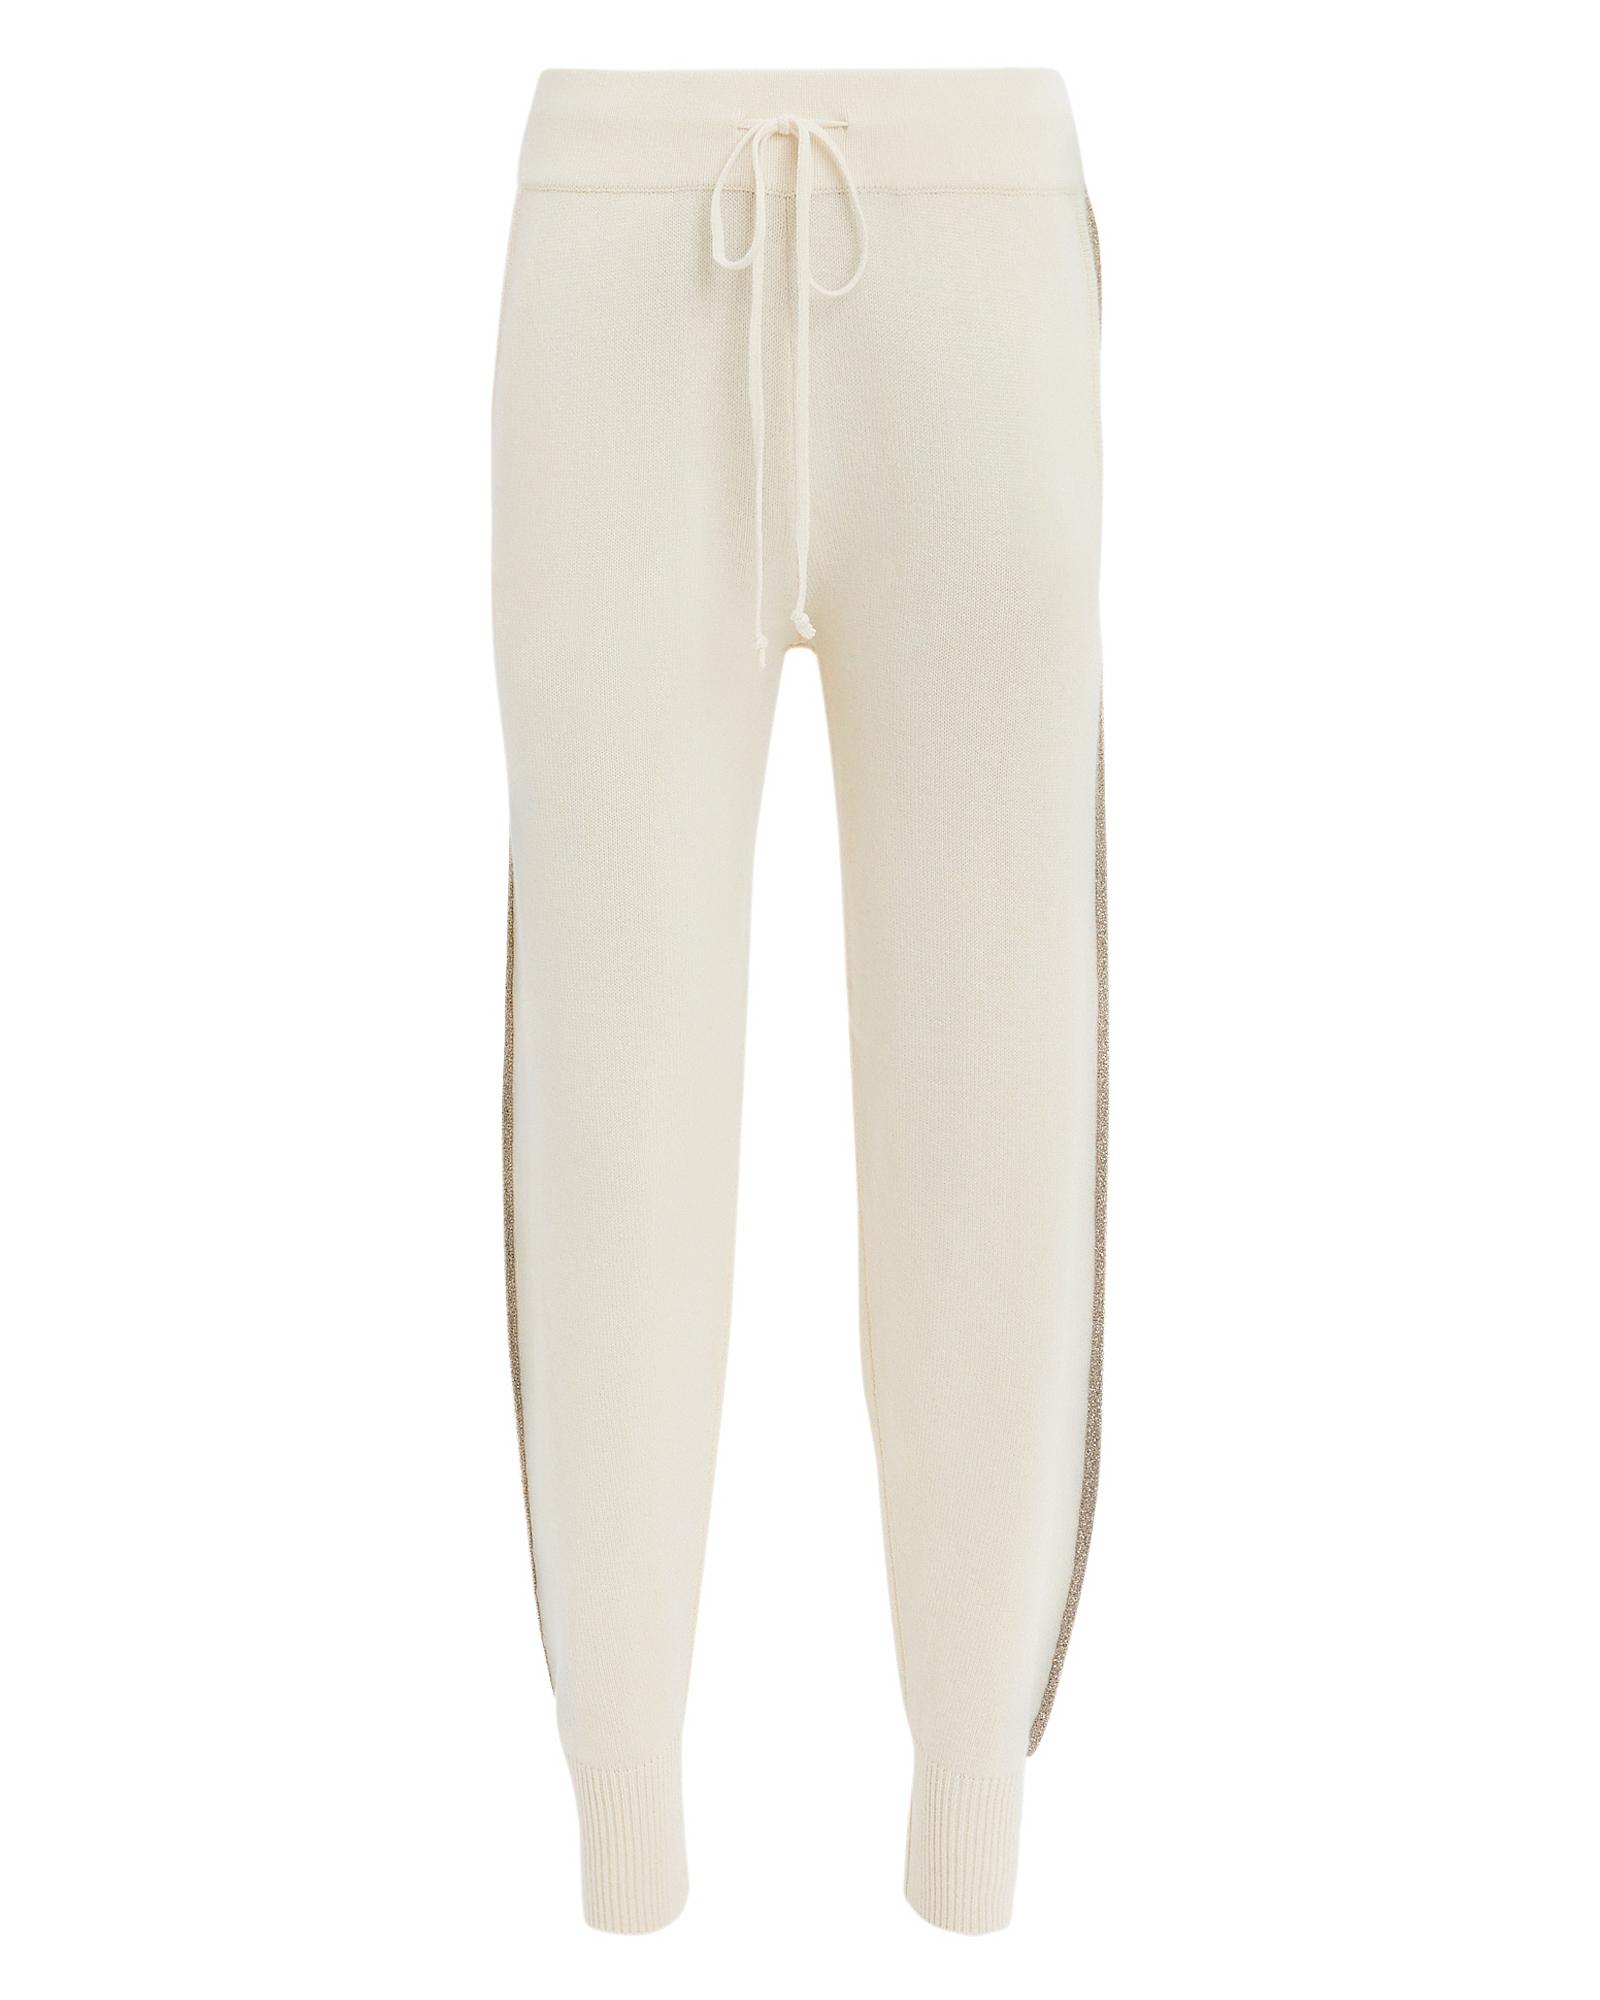 10 Crosby Lurex Jogger Ivory Sweatpants